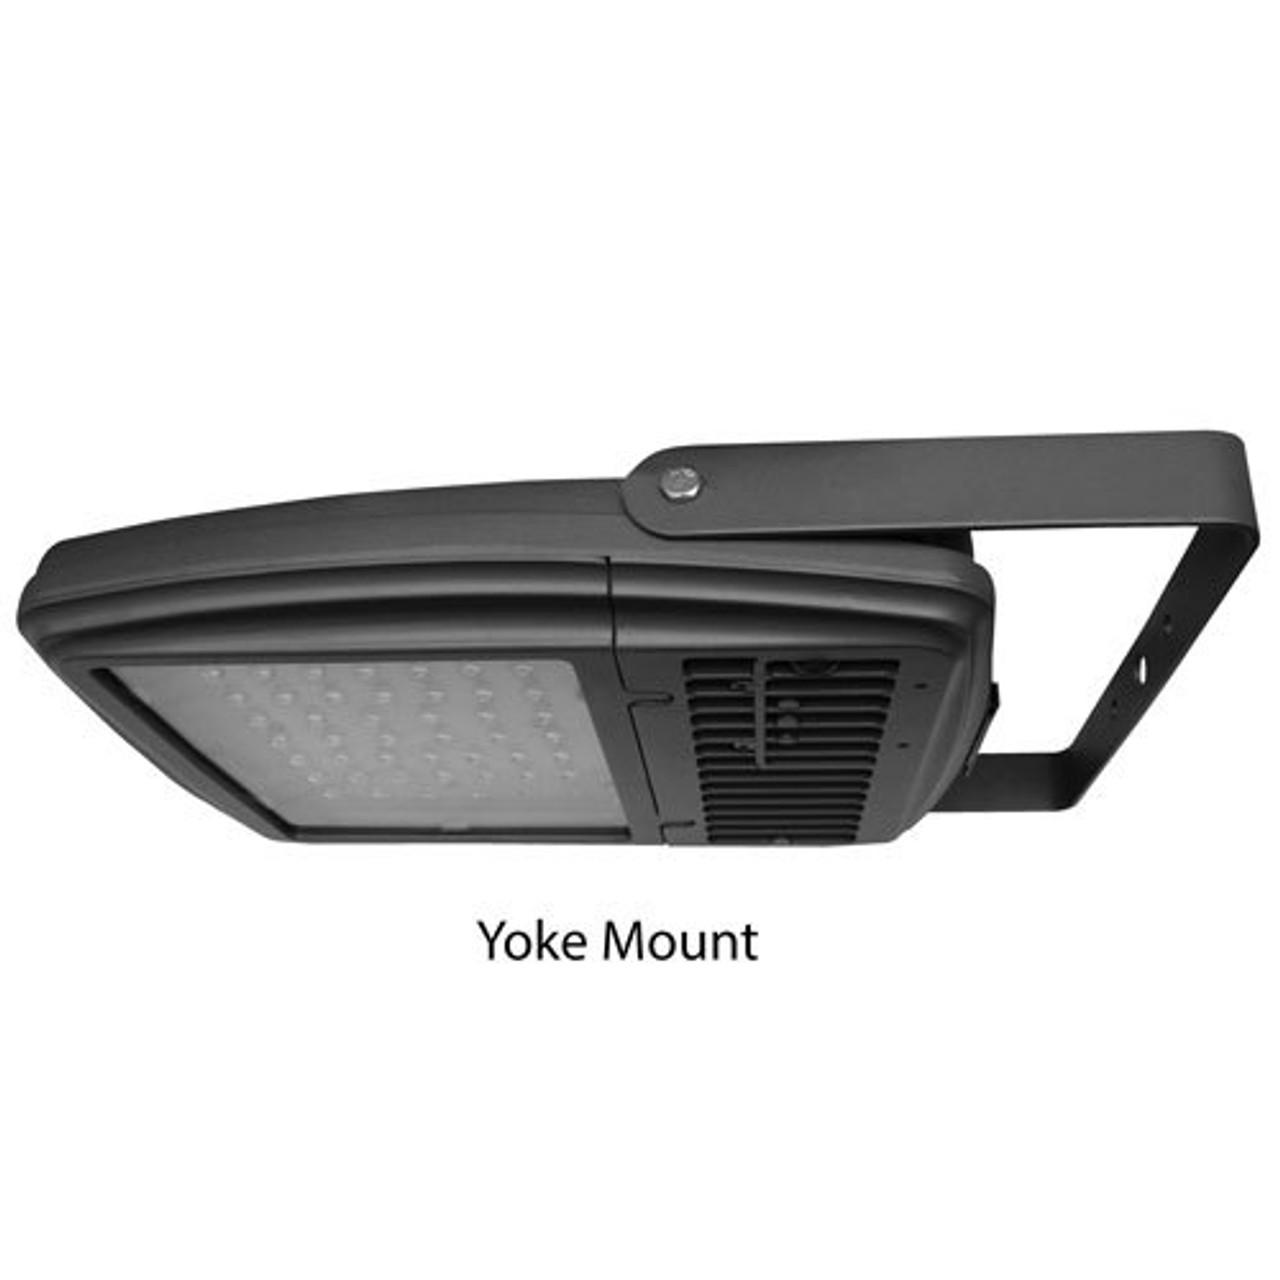 112 Watt Amber LED Floodlight Light With Yoke Mount